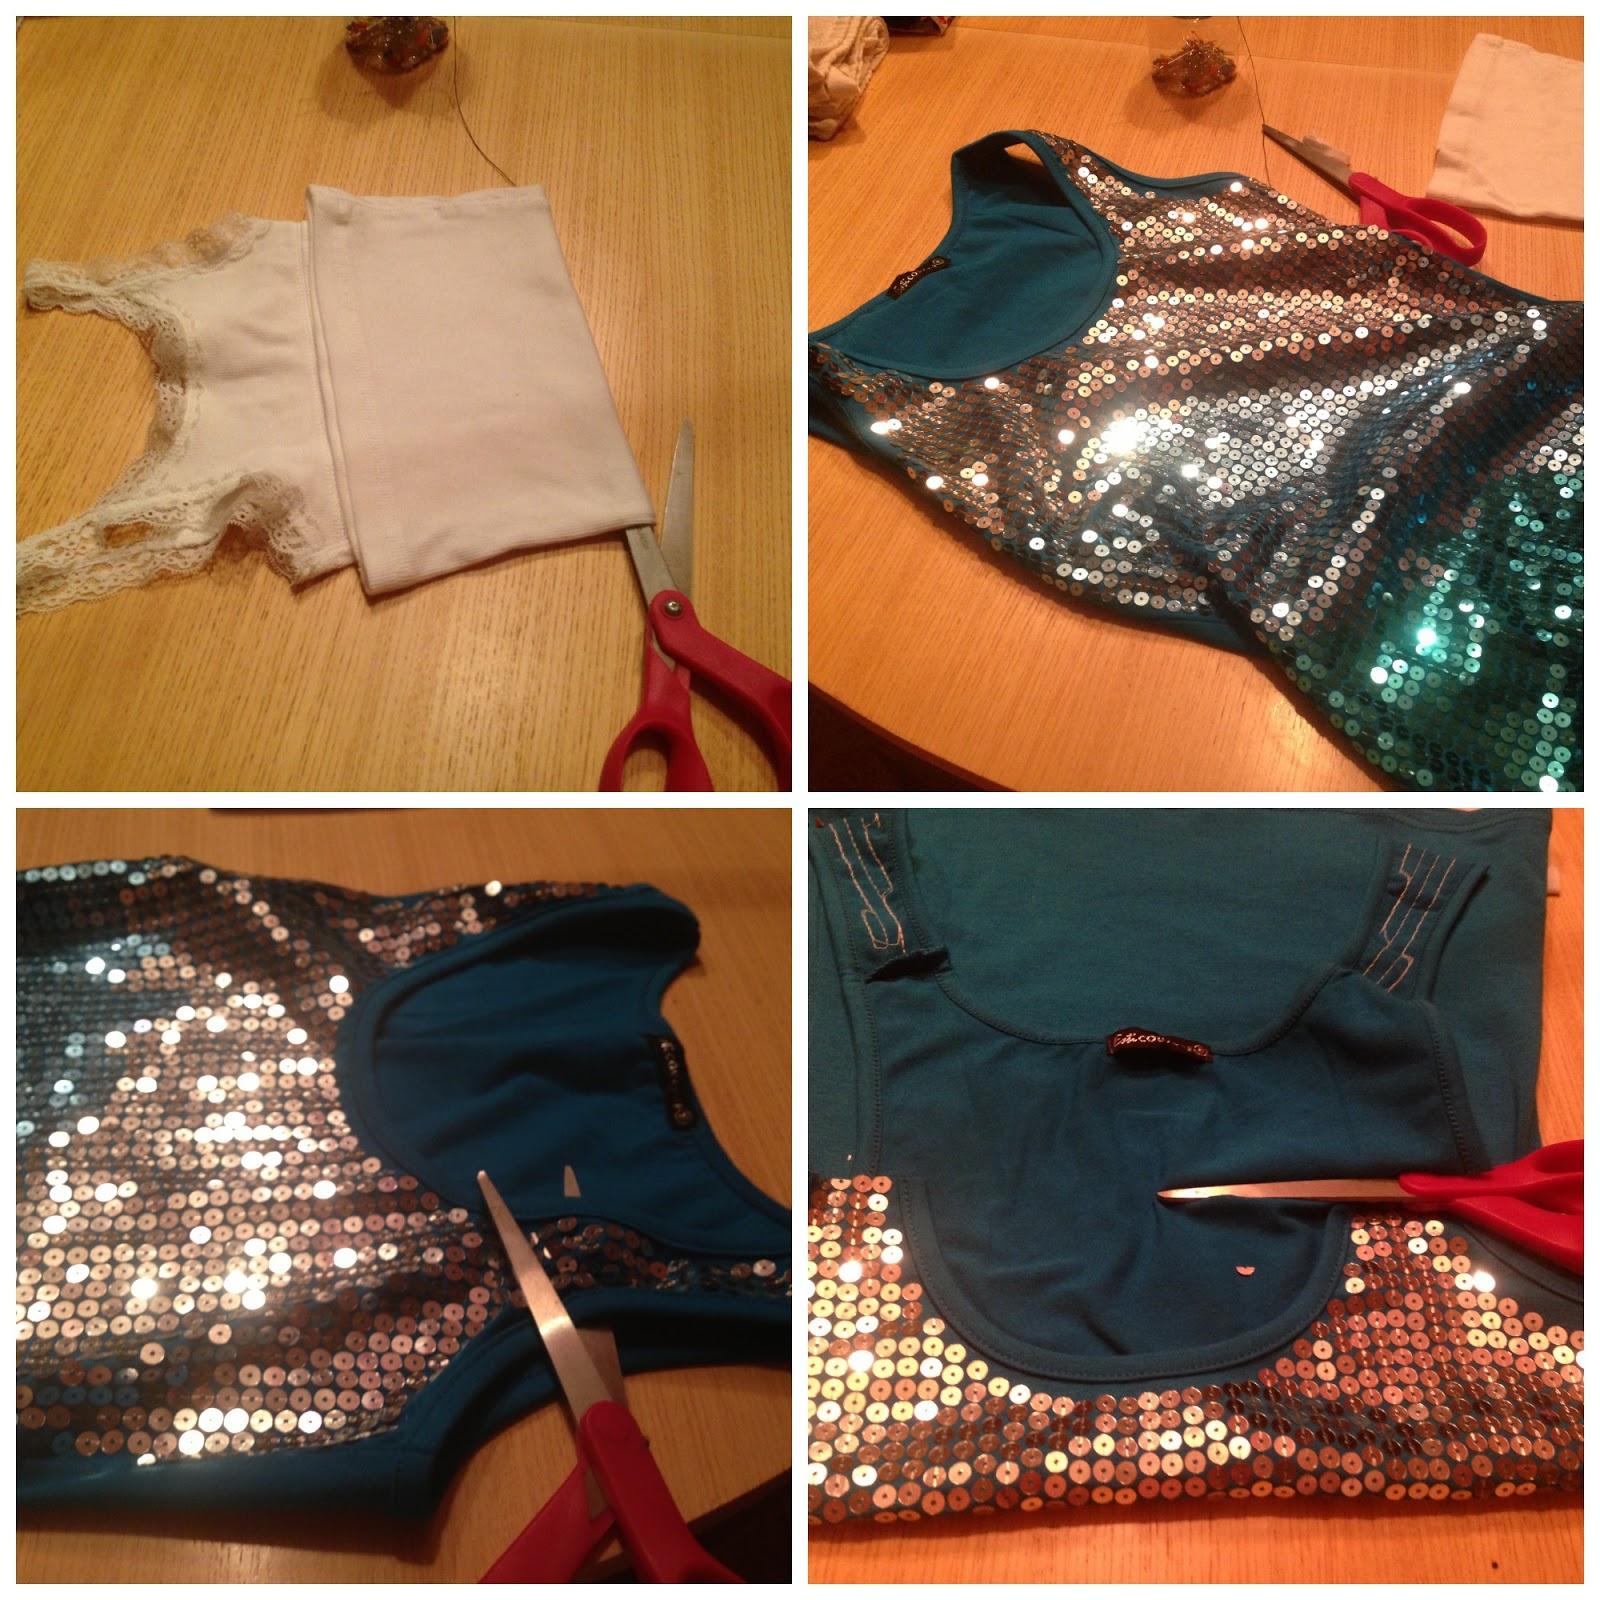 Friday June 28 2013 & LoLovie: Mermaid dress DIY